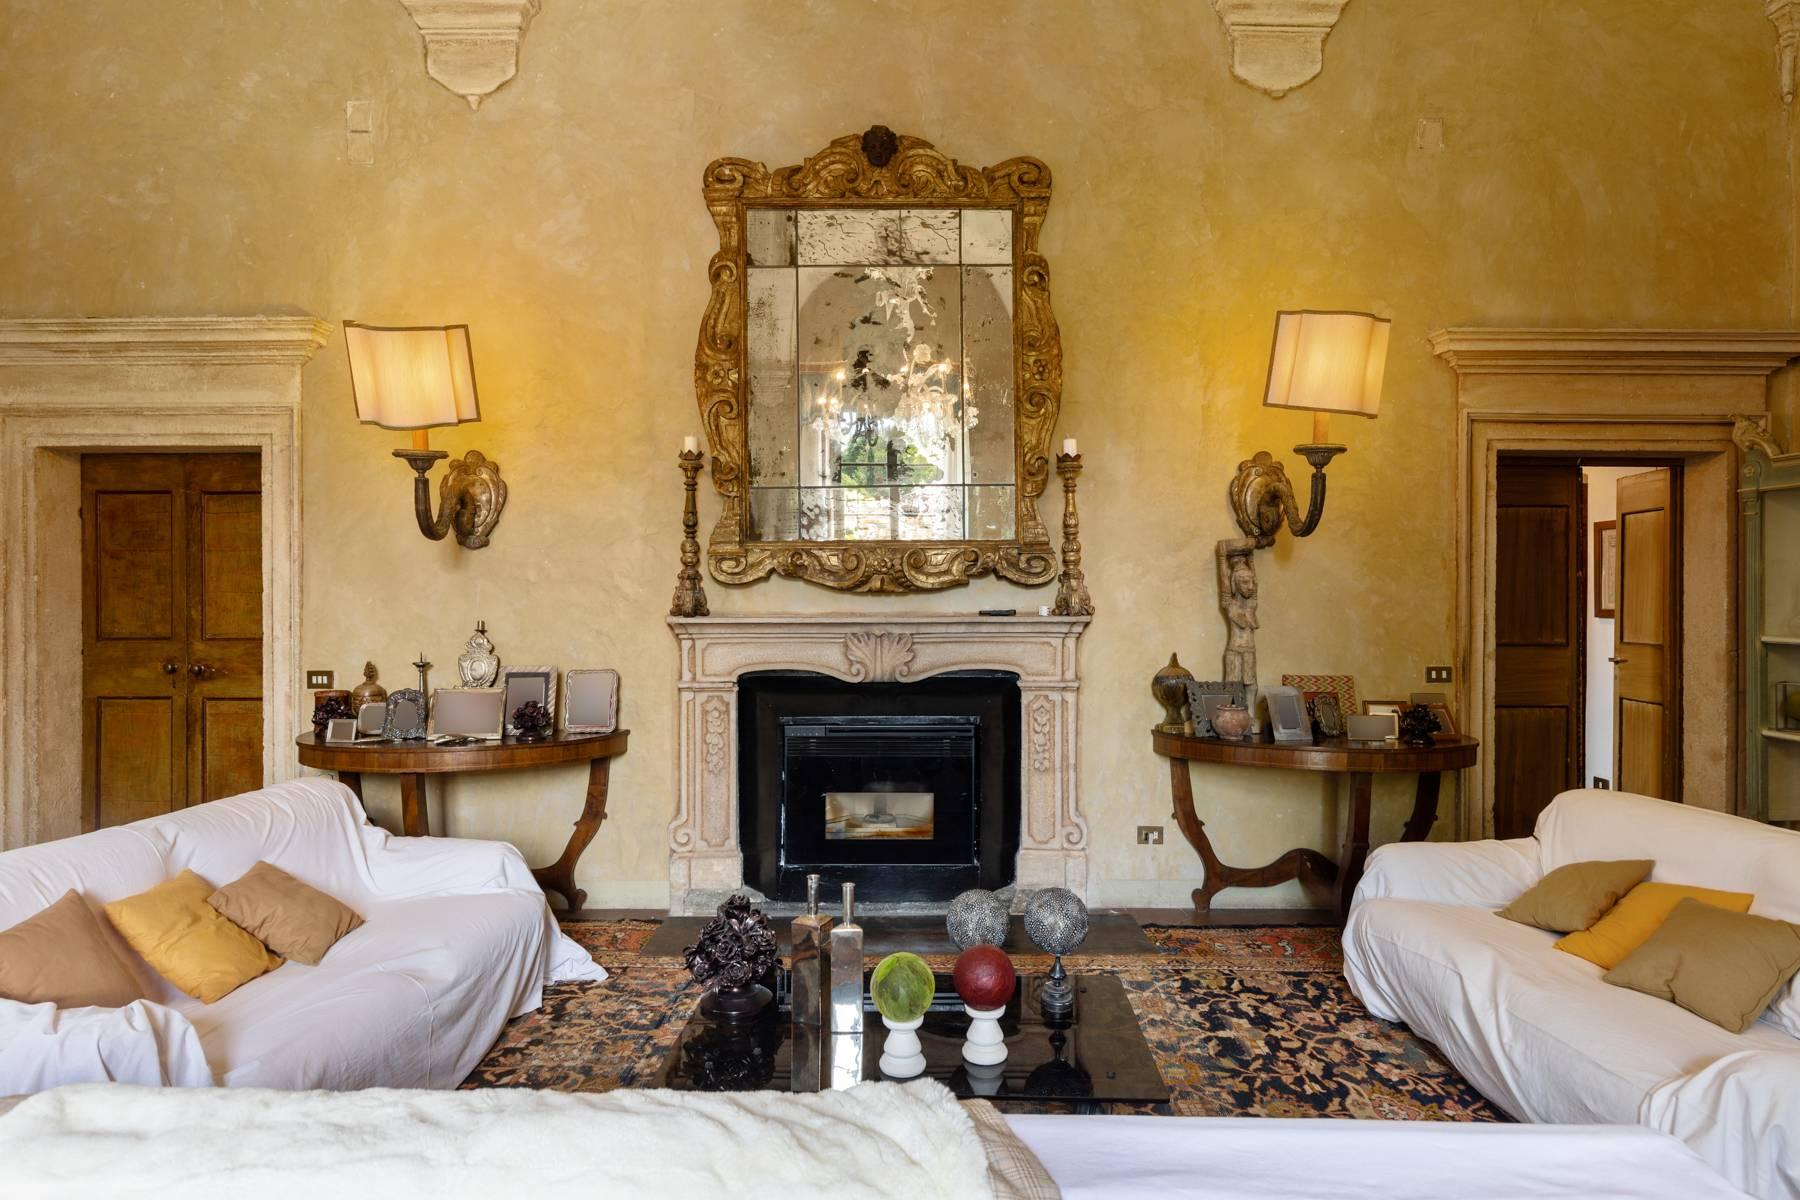 Villa in Vendita a Verona: 5 locali, 2400 mq - Foto 20